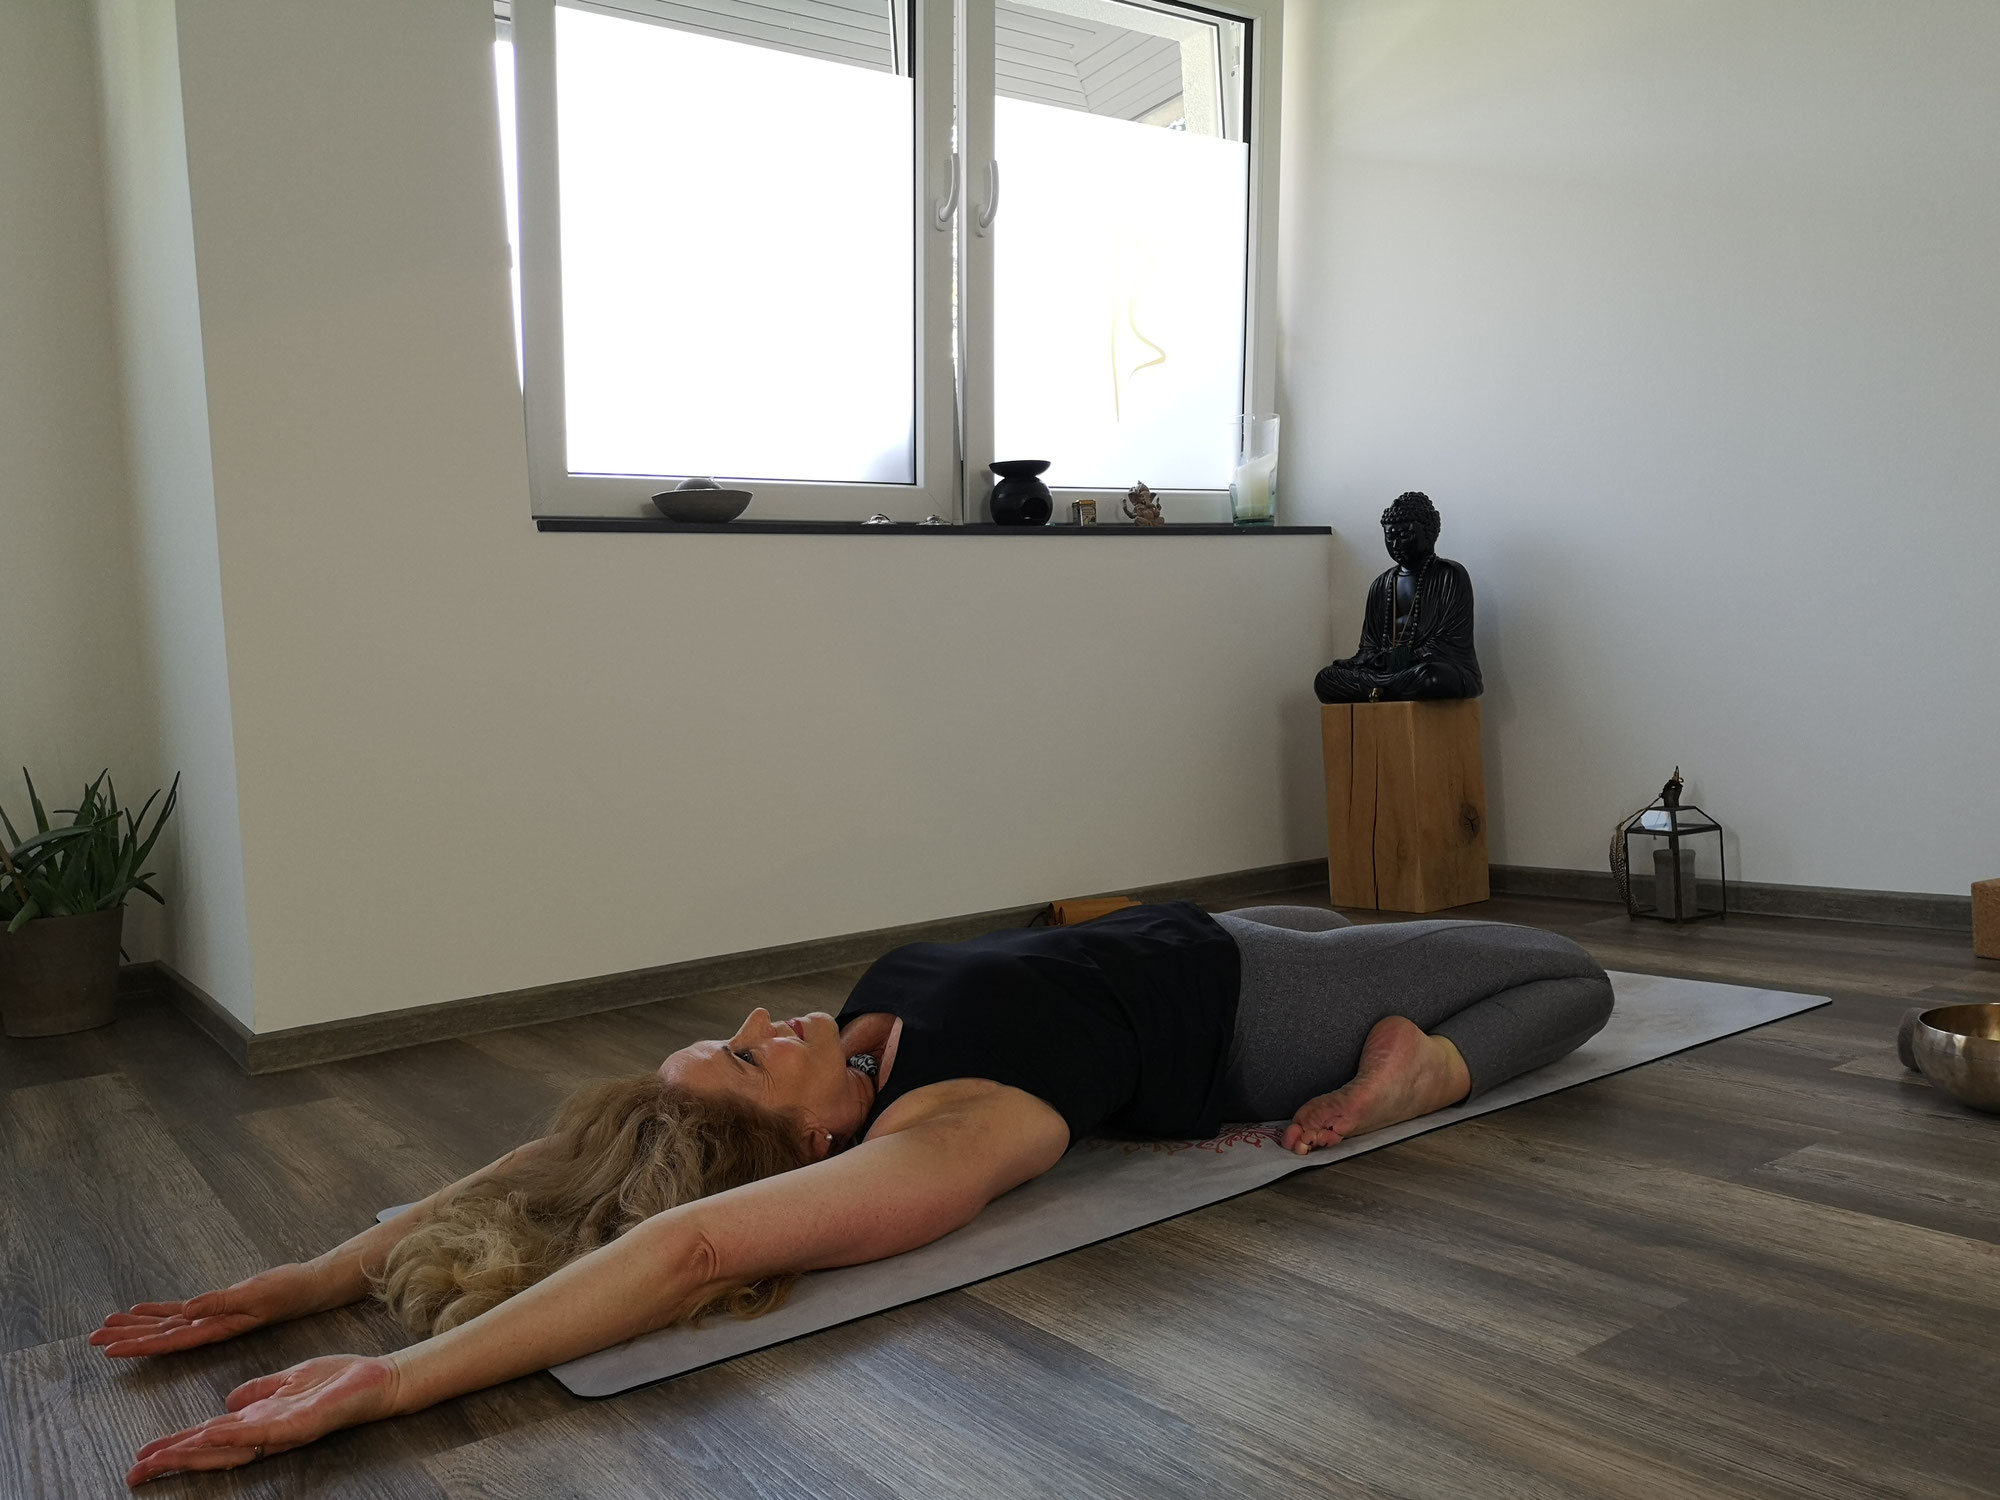 10-Wochen-Yin-Yoga-Kurs mit Kerstin